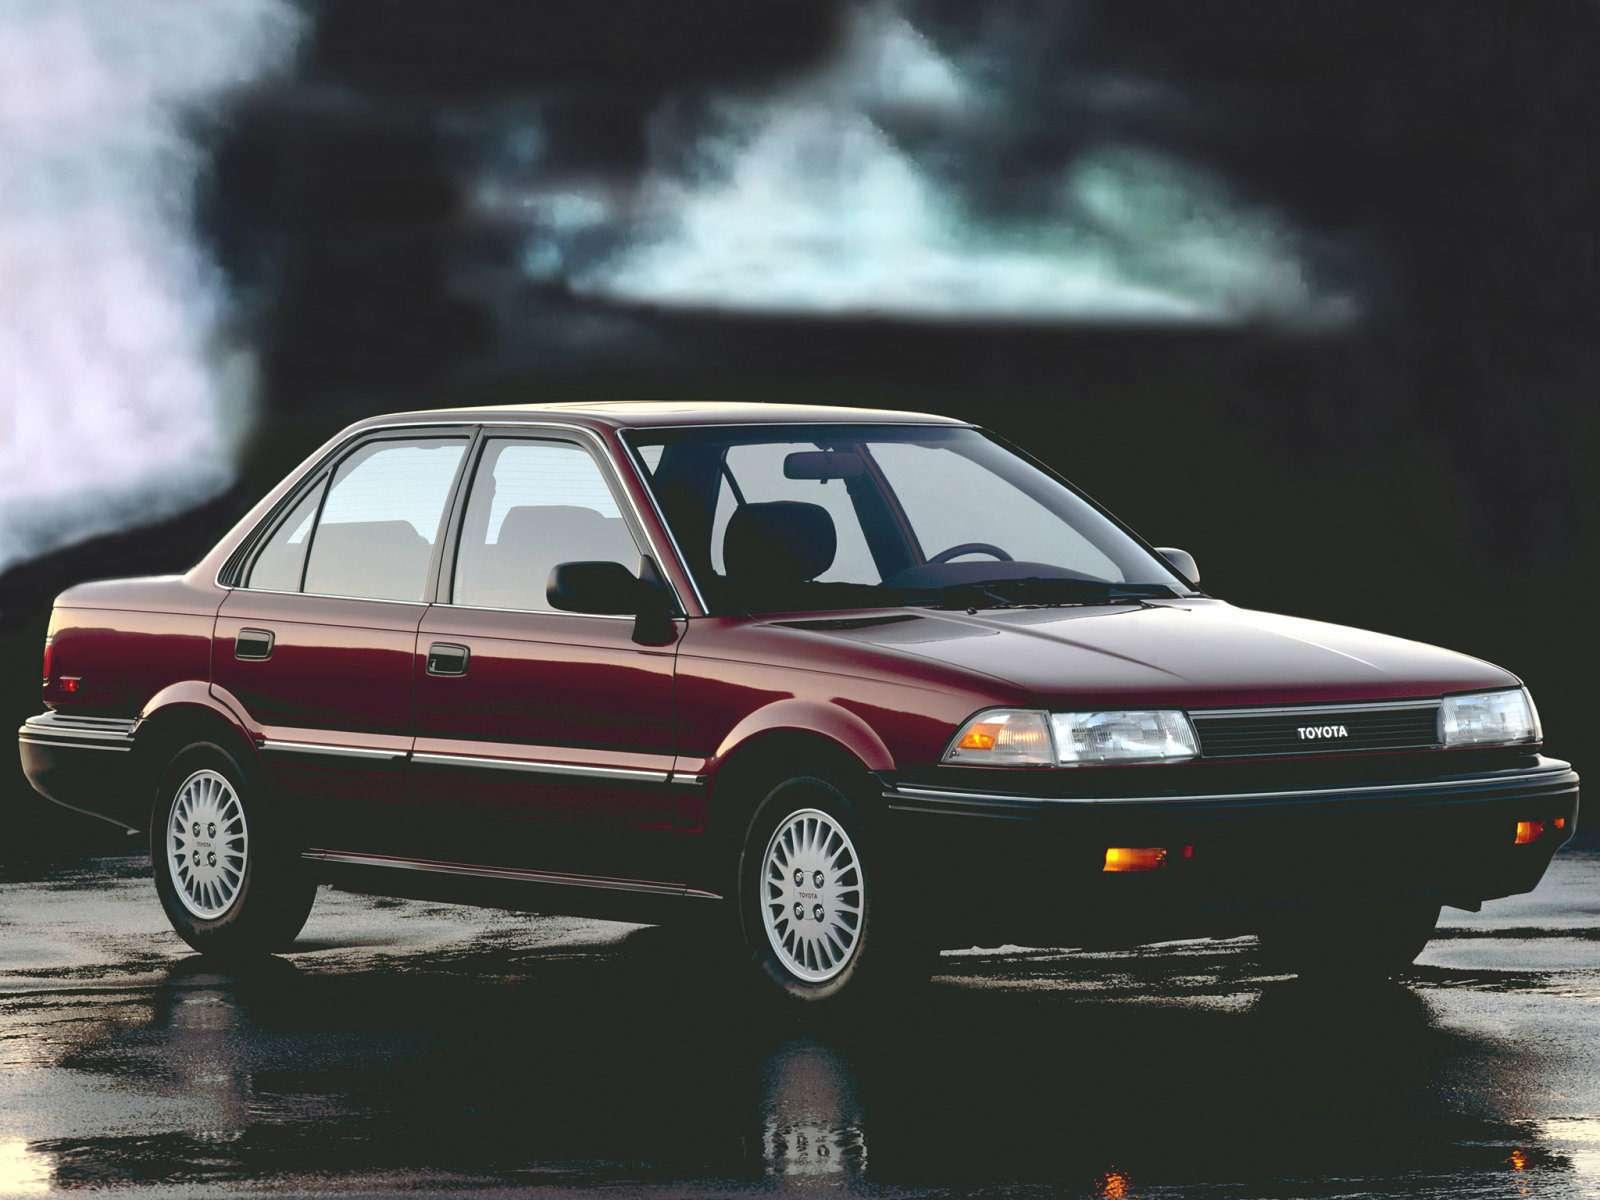 Toyota_Corolla_Sedan_1987_2